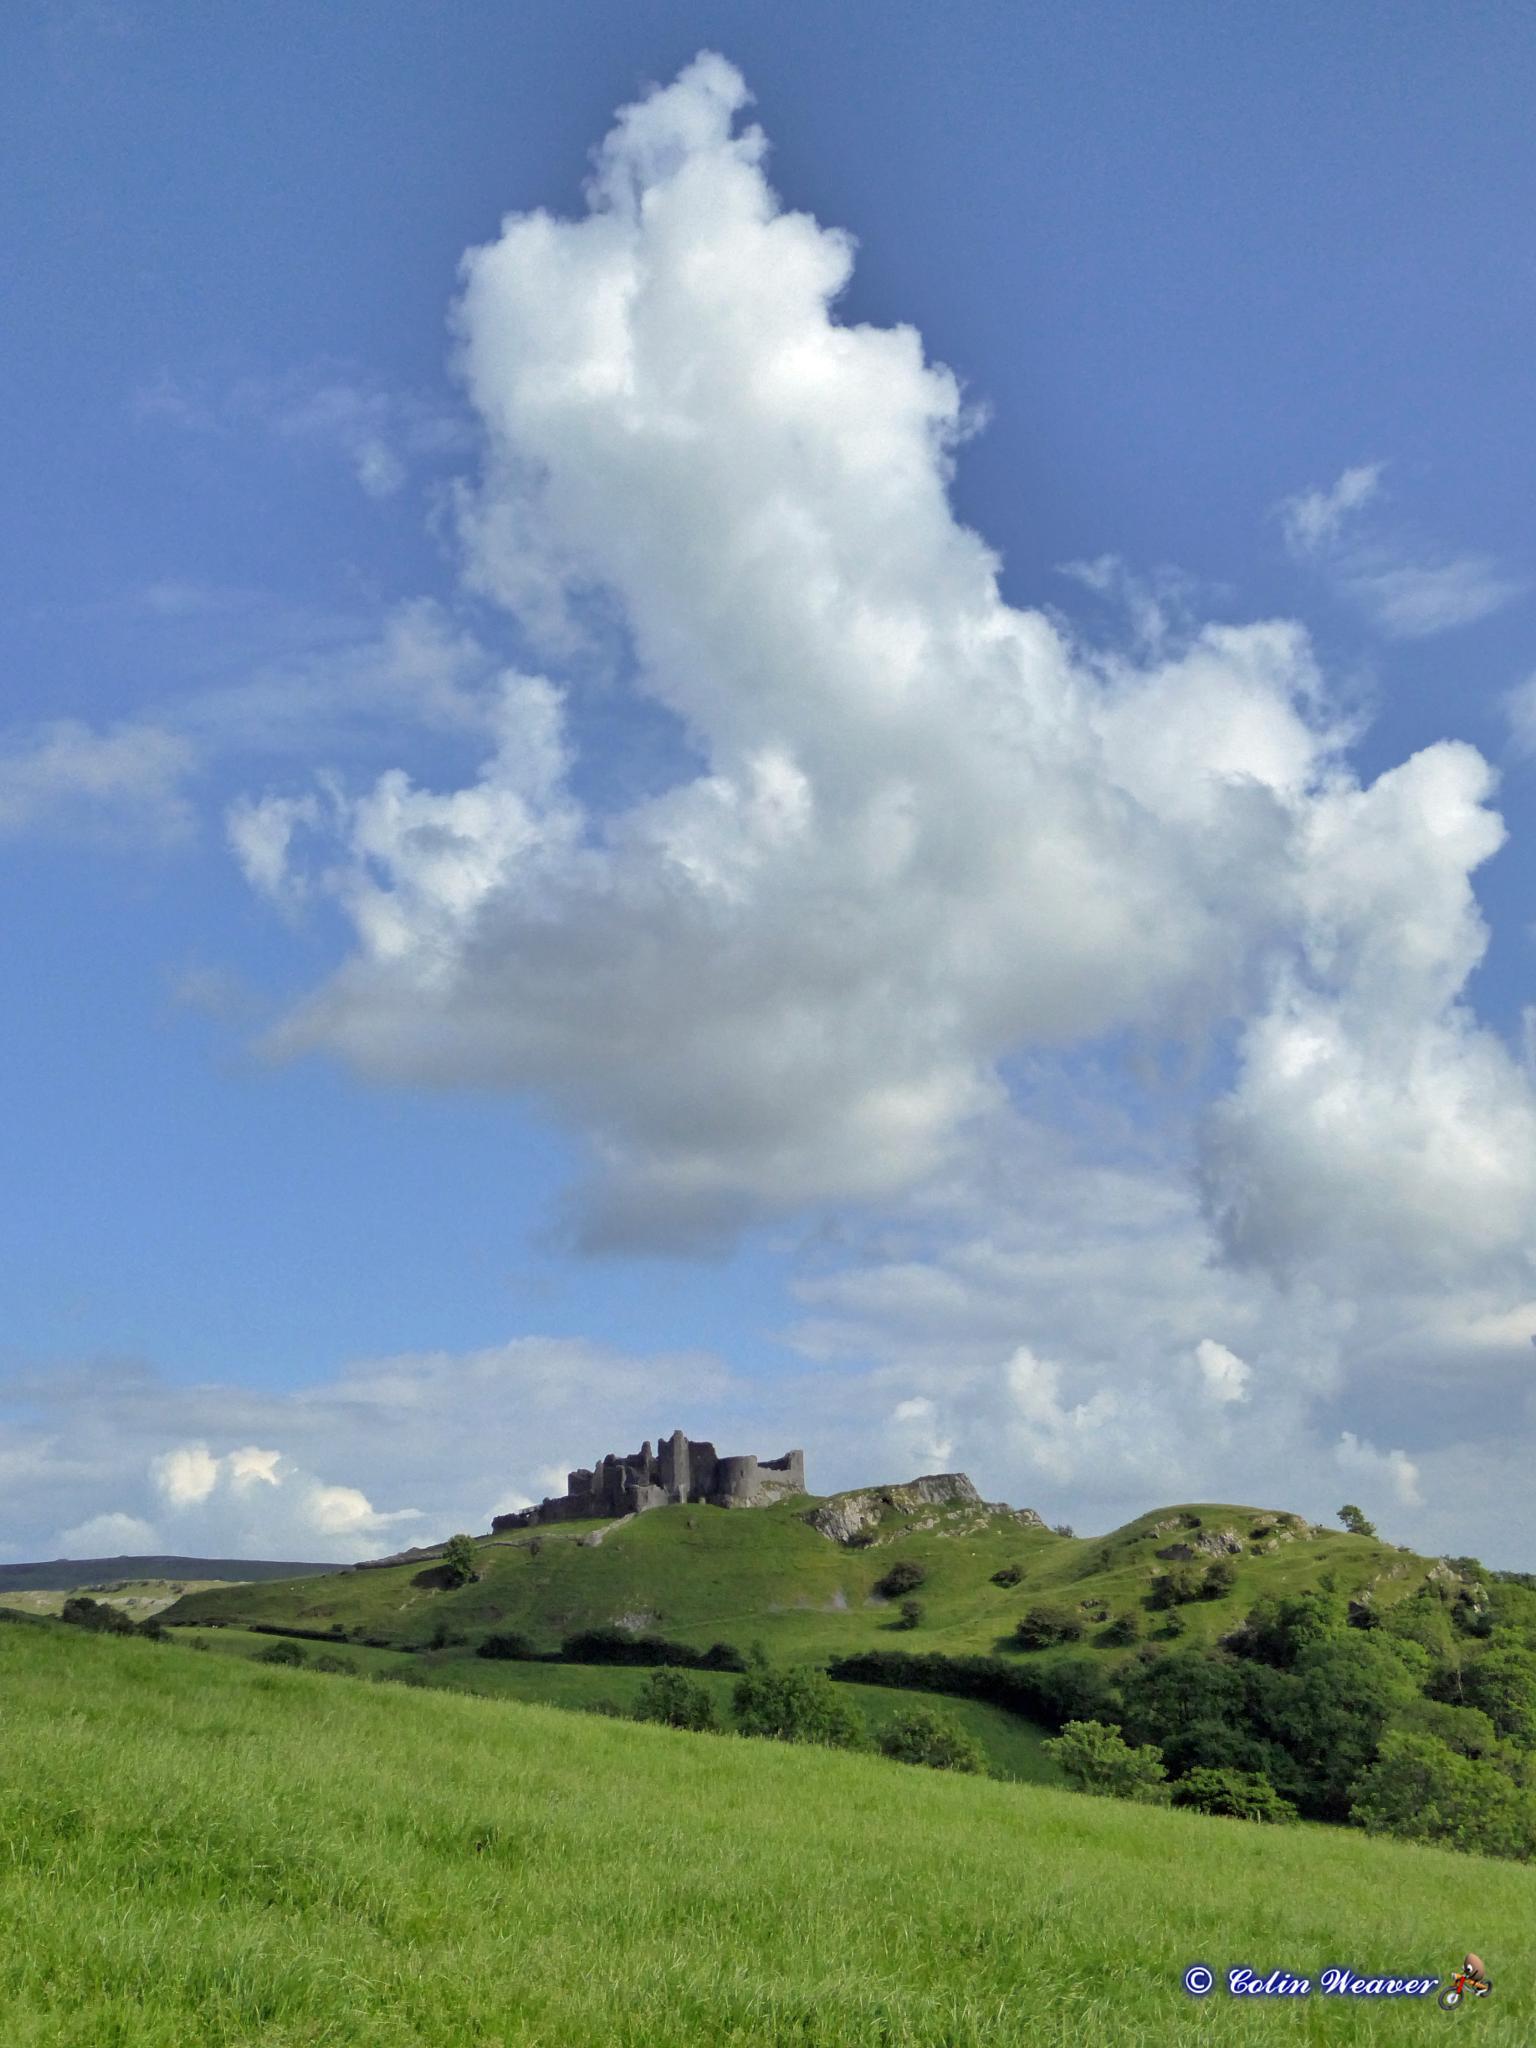 Carreg Cennan Clouds by cln.wvr